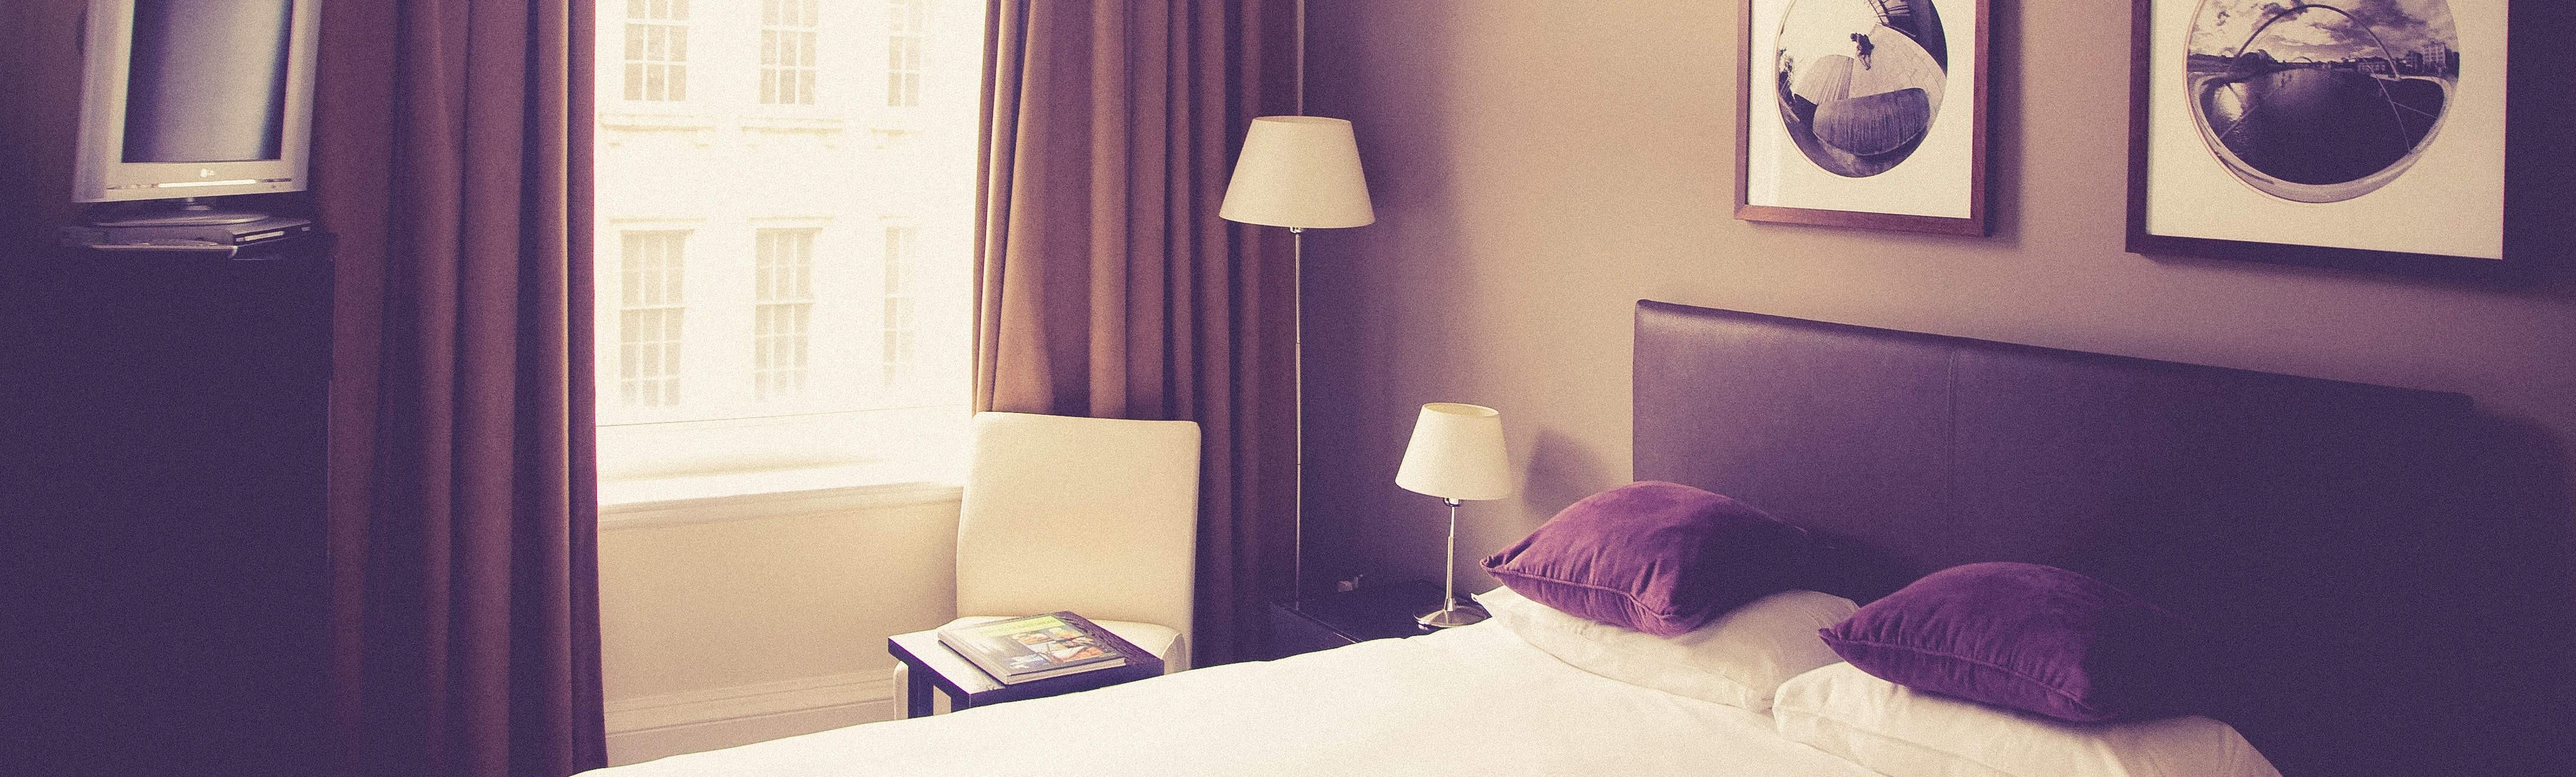 Hostales y hoteles